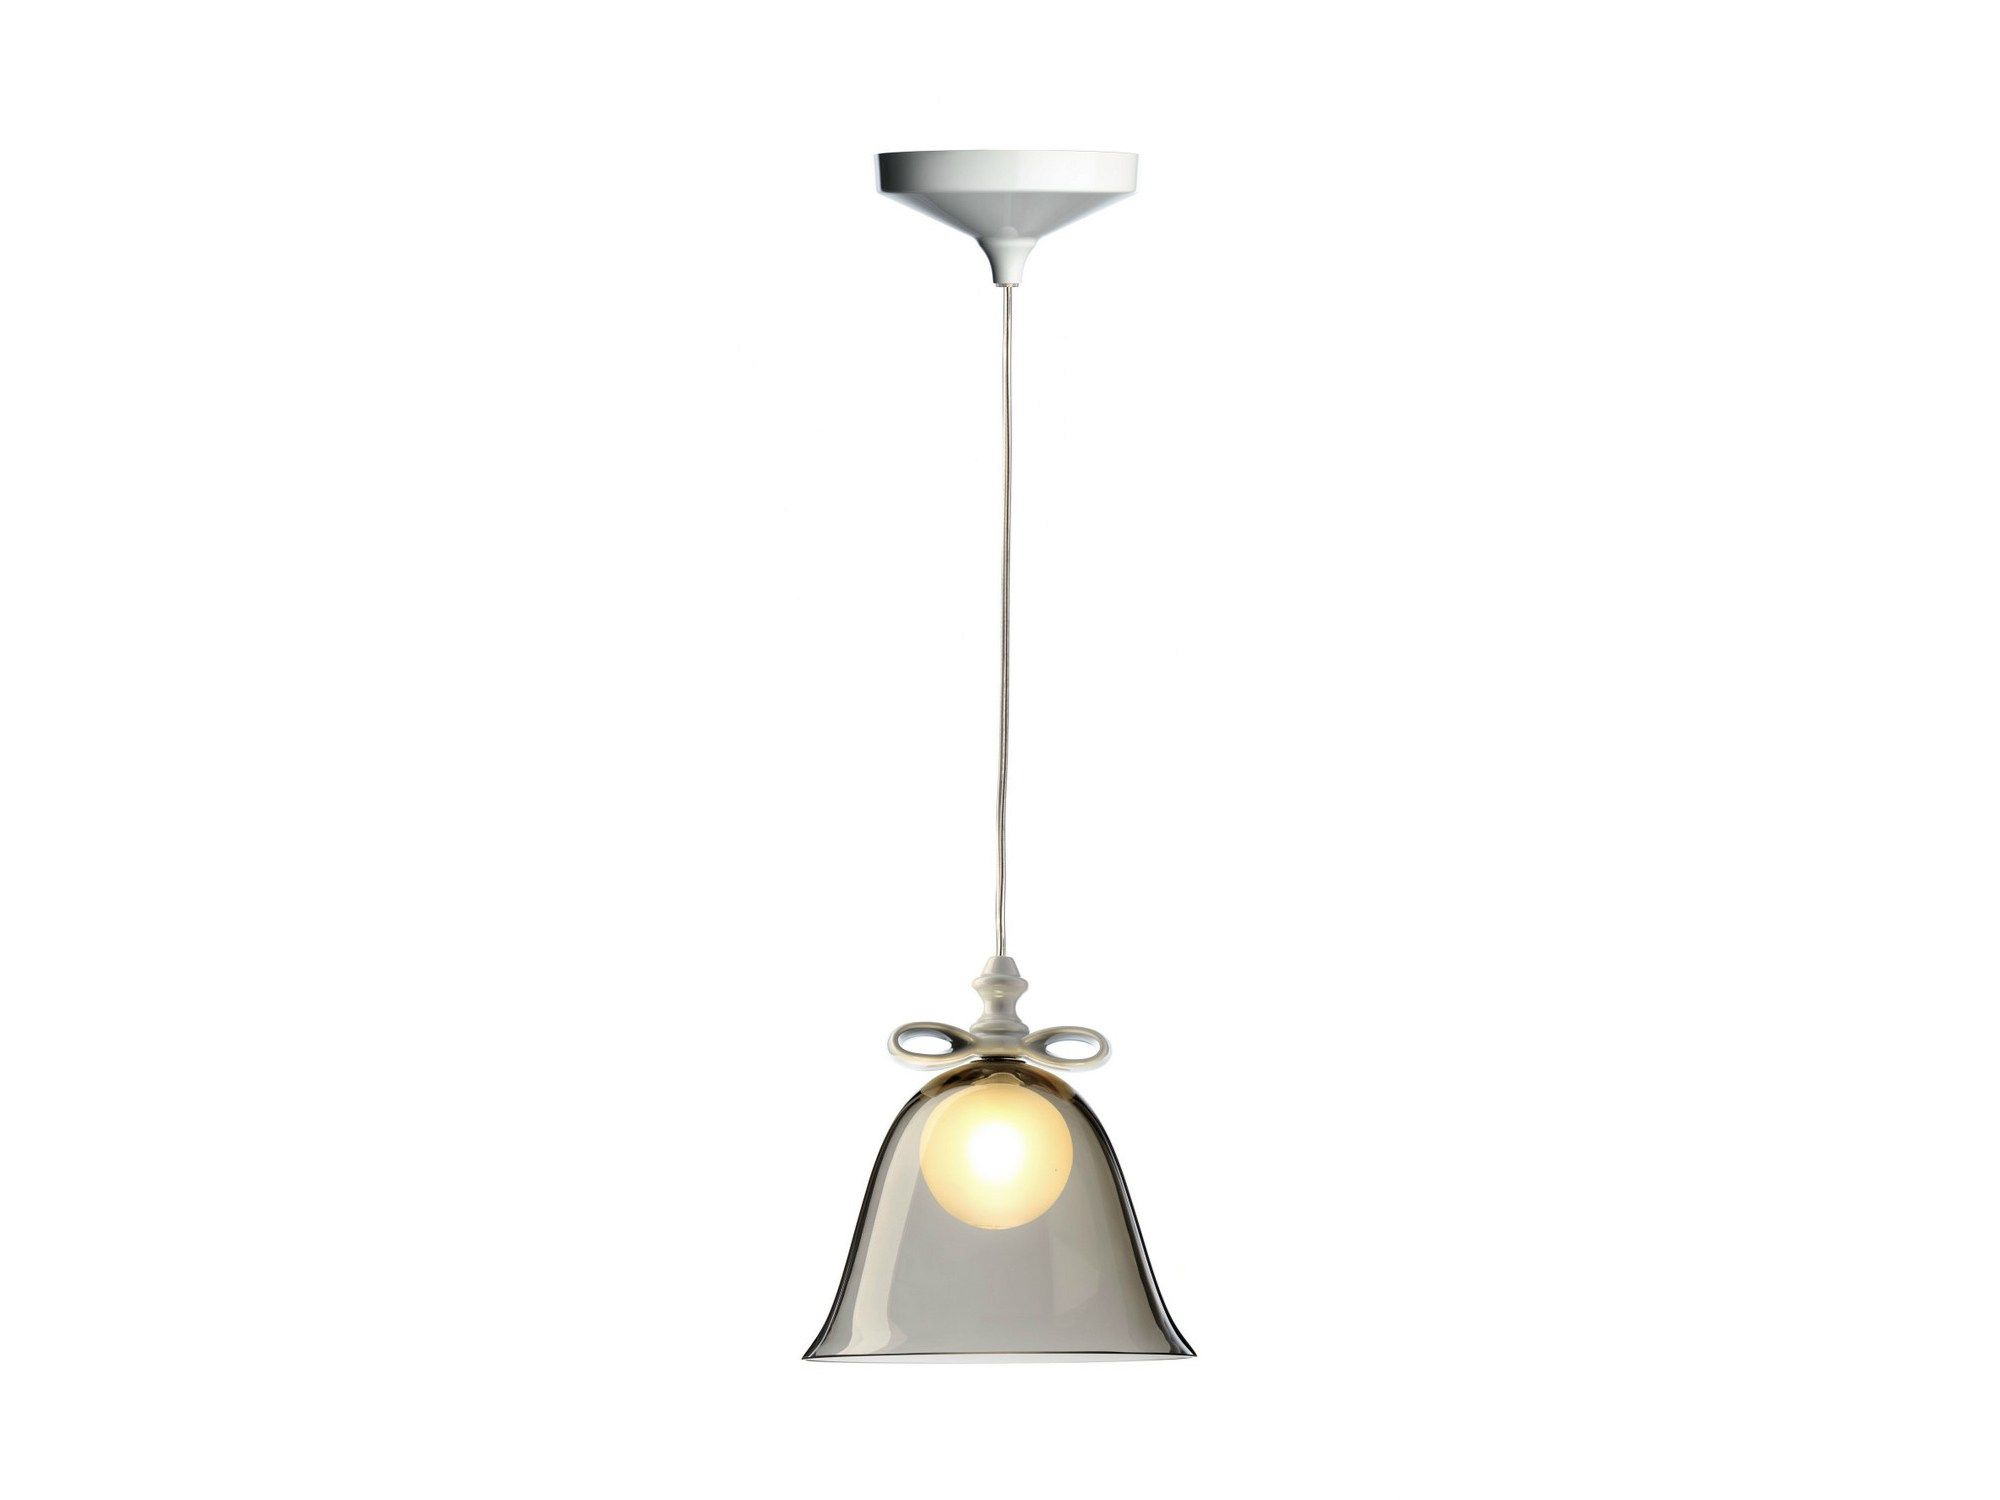 Lampada a sospensione in vetro soffiato BELL LAMP by Moooi© design Marcel Wanders